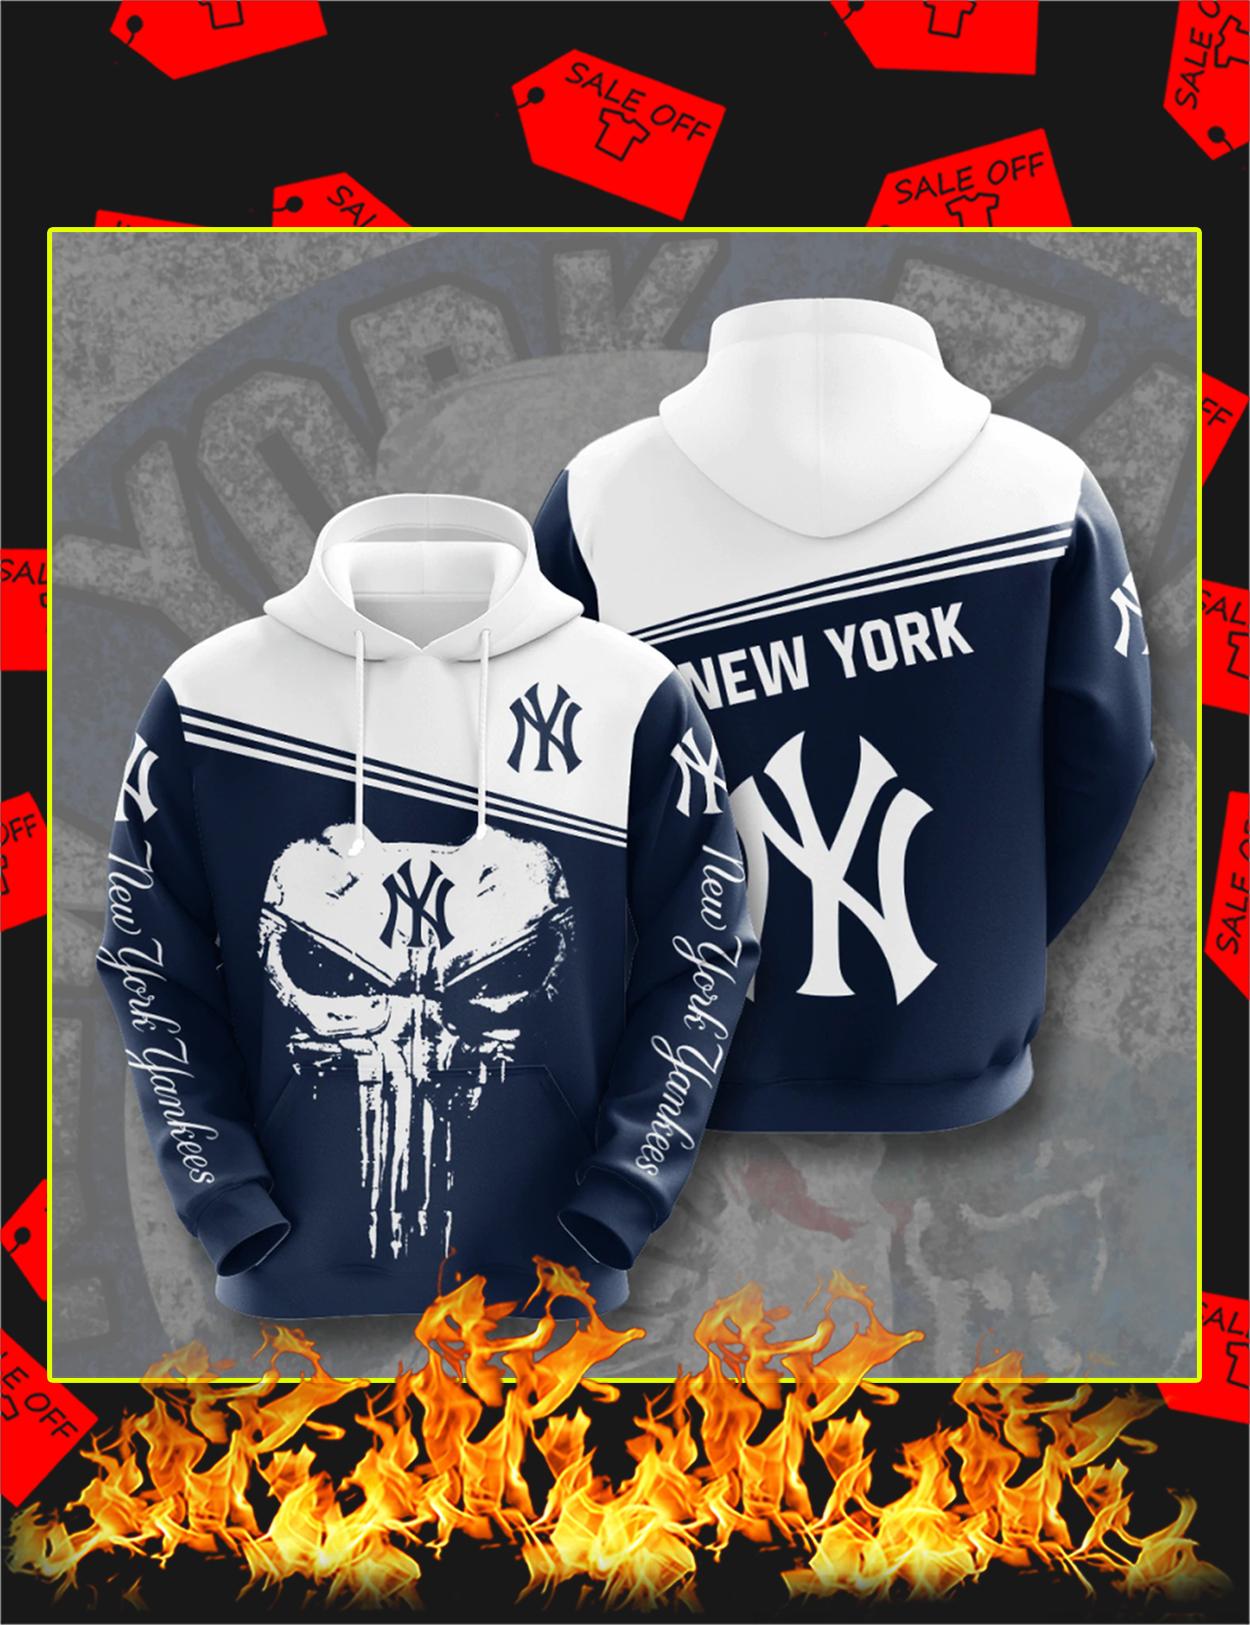 New York Yankees Punisher Skull 3D Hoodie - Size M